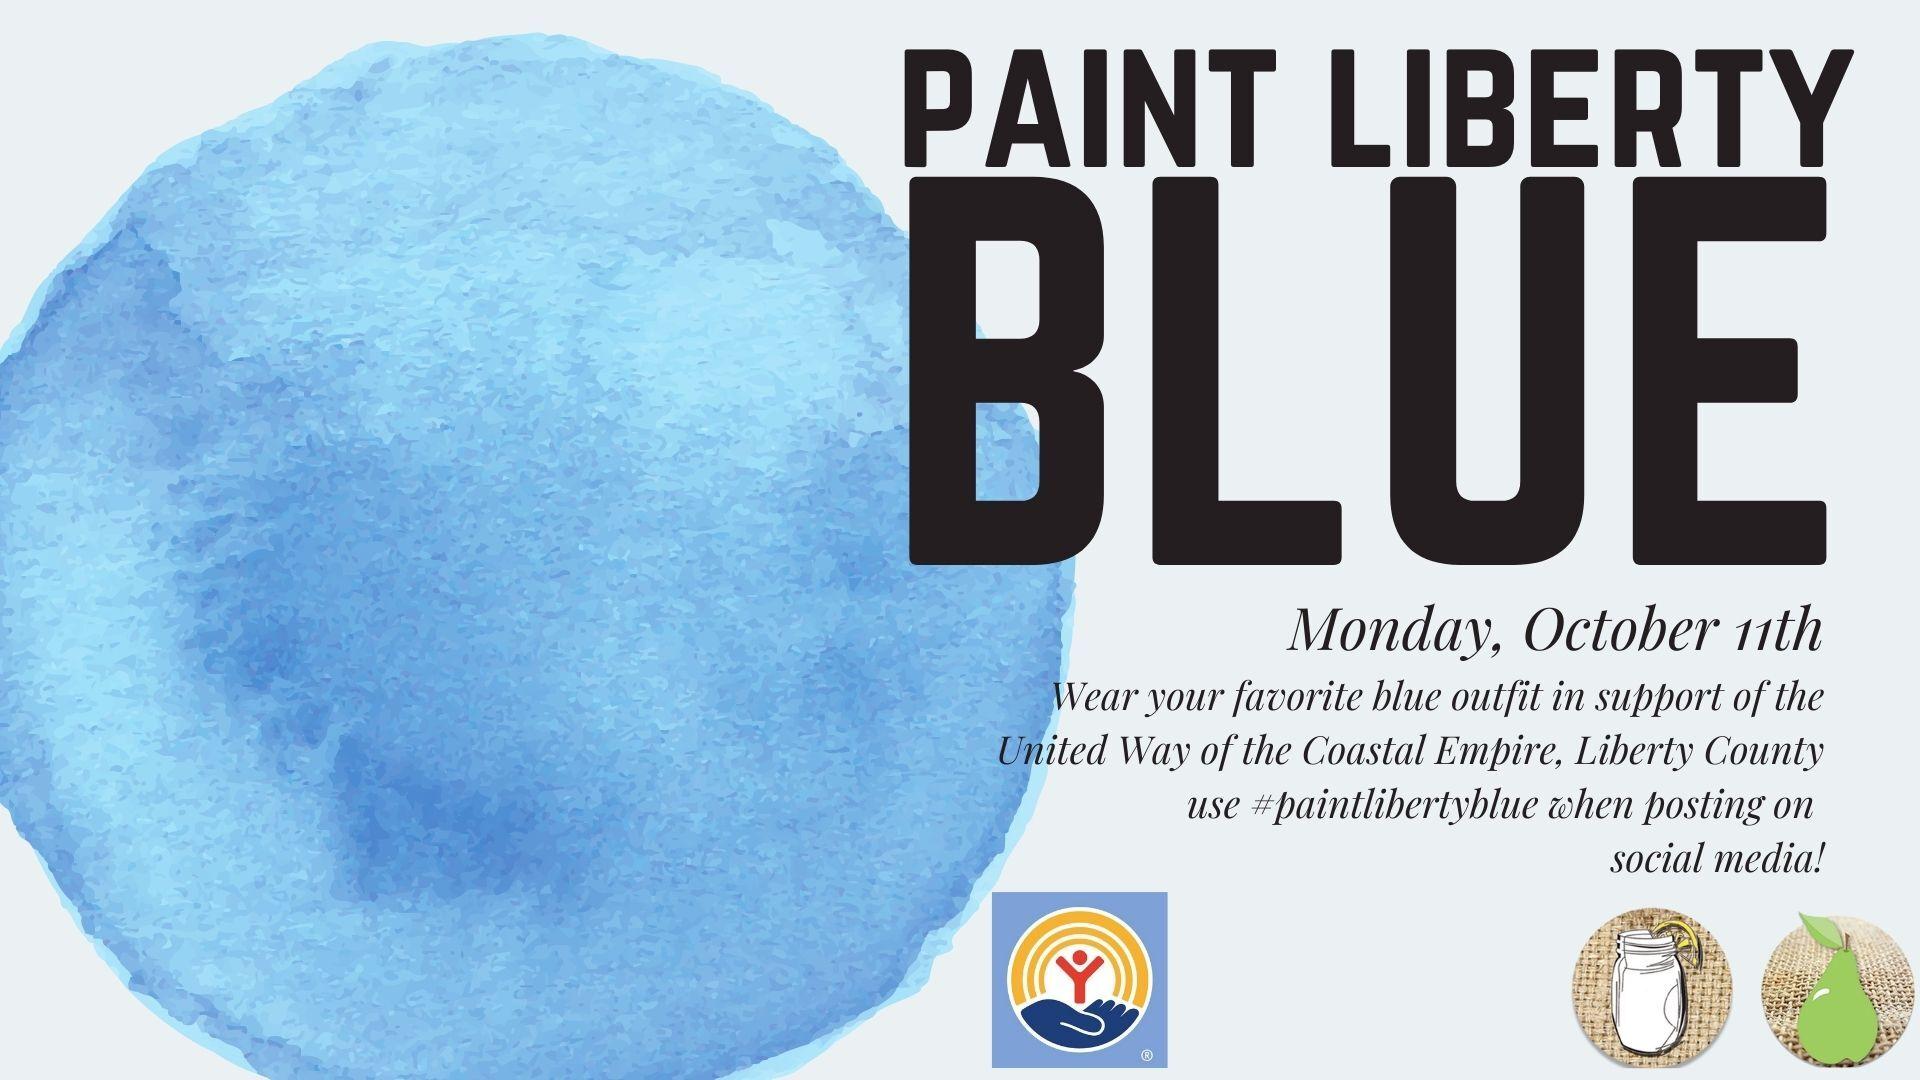 Paint Liberty Blue